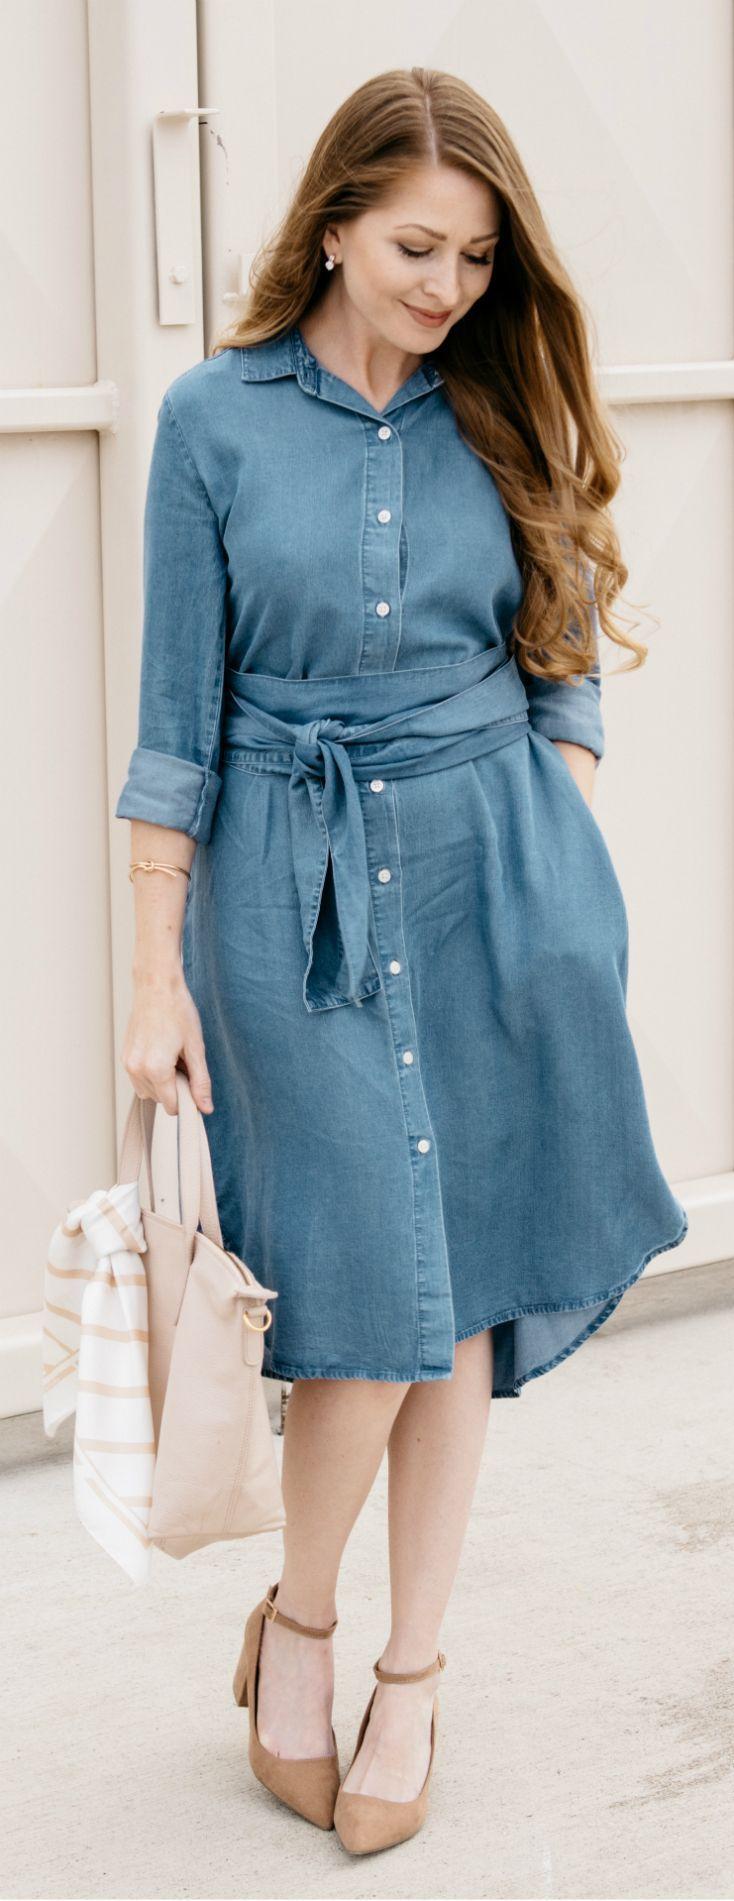 GAP Denim Shirt Dress / Chambray Shirt Dress / Cuyana Tote / Fashion ...